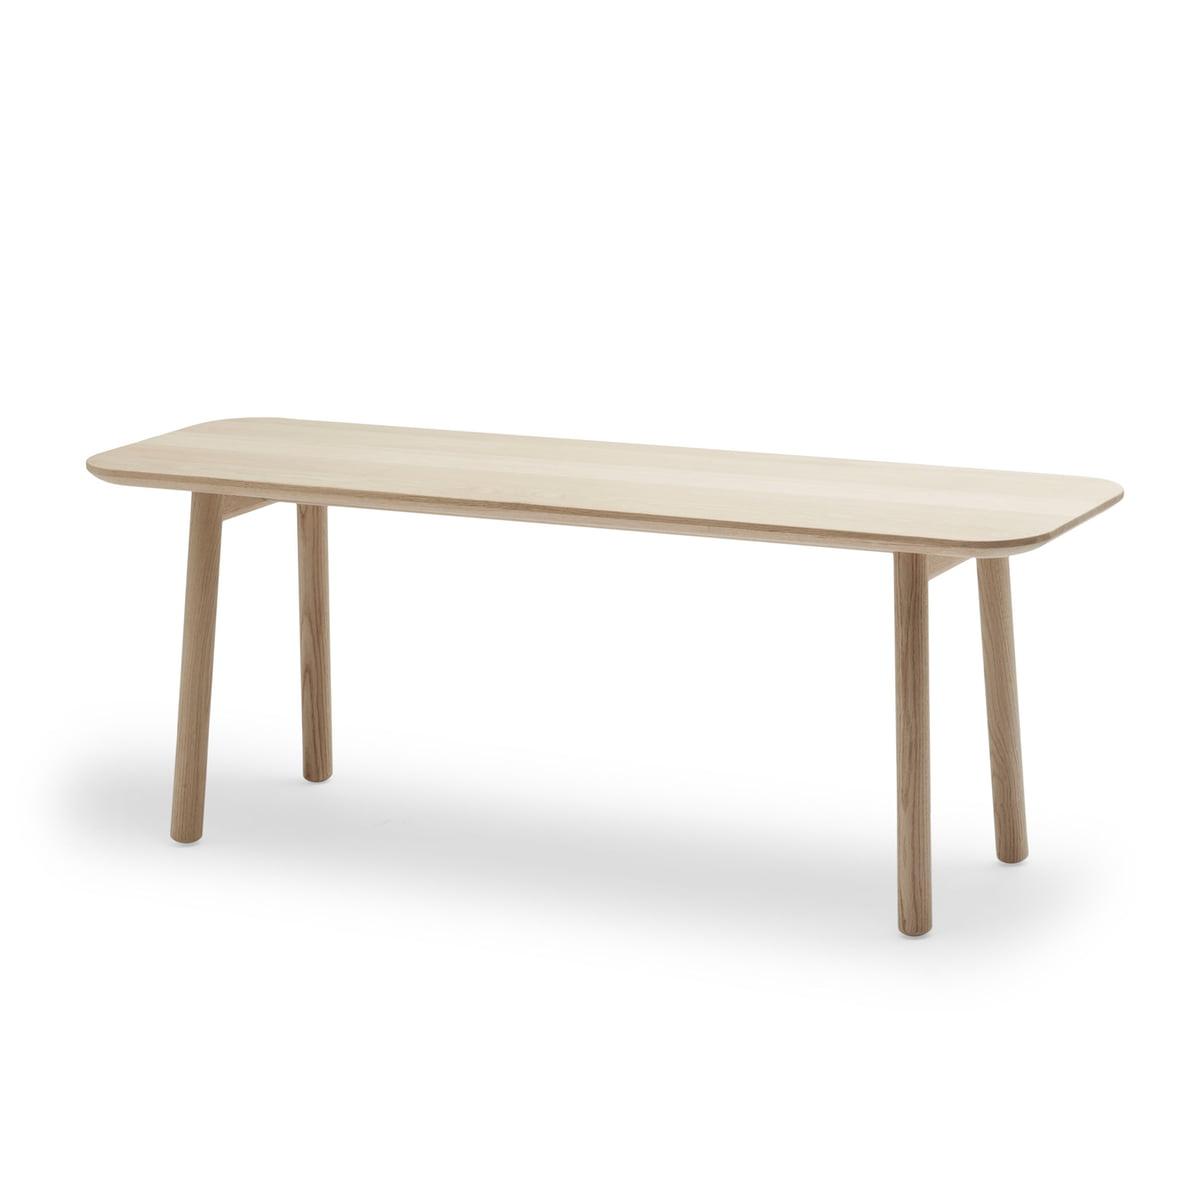 Wooden bench hven by skagerak connox shop Oak bench